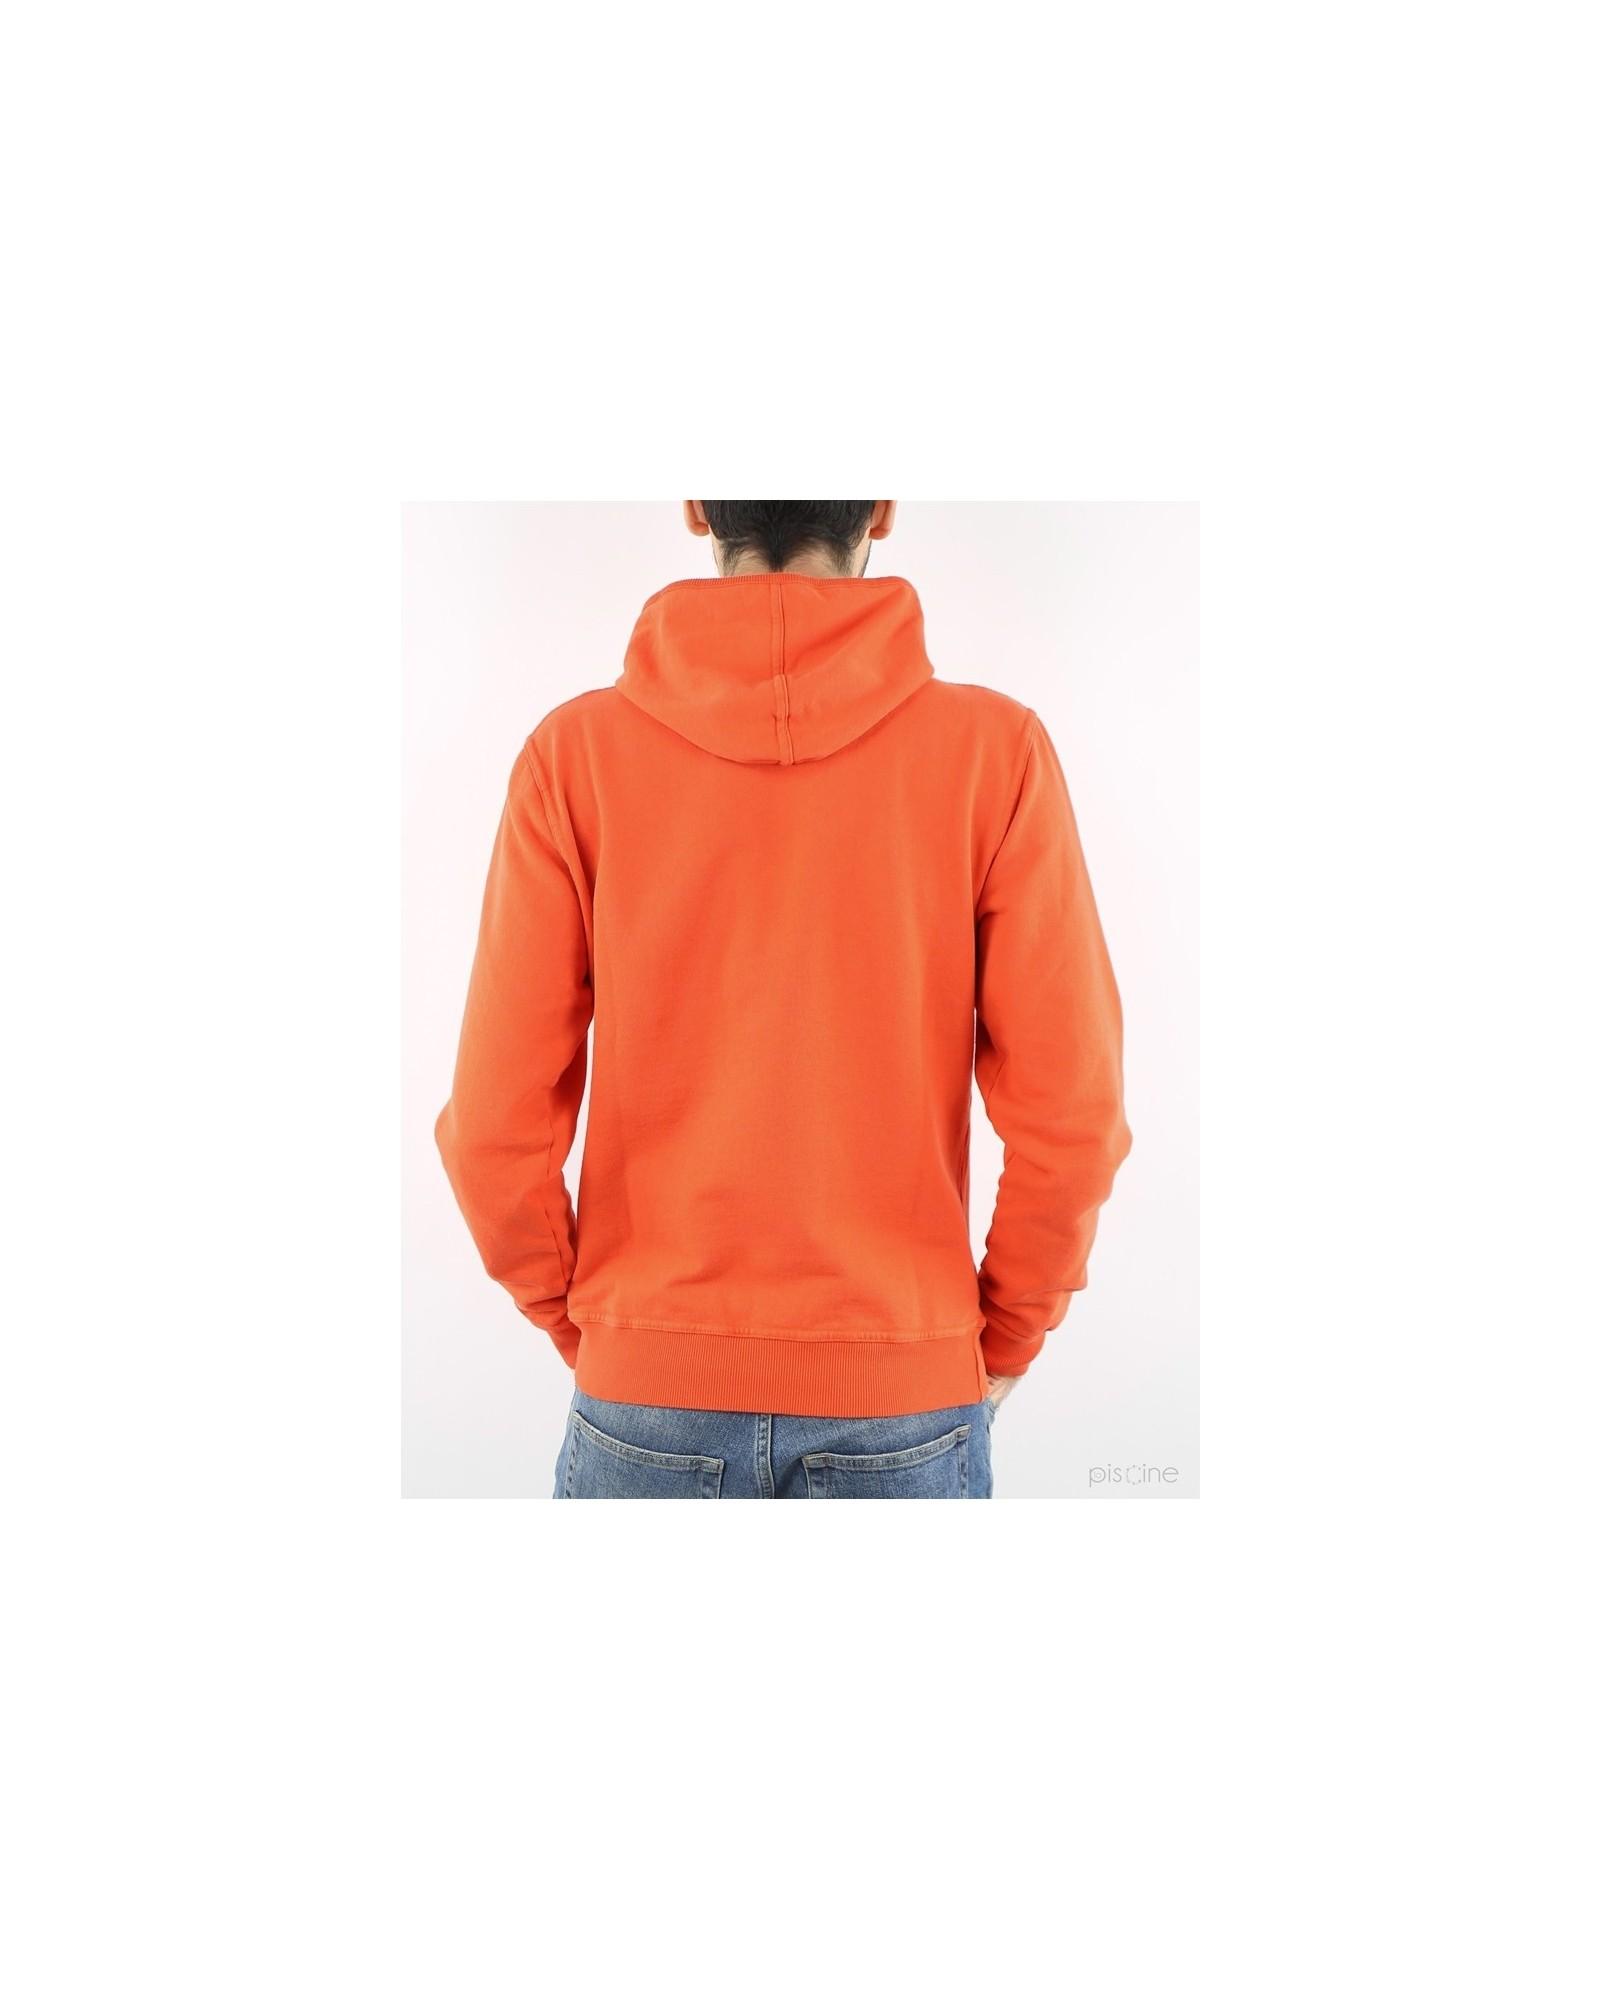 Sweat orange avec capuche Soho